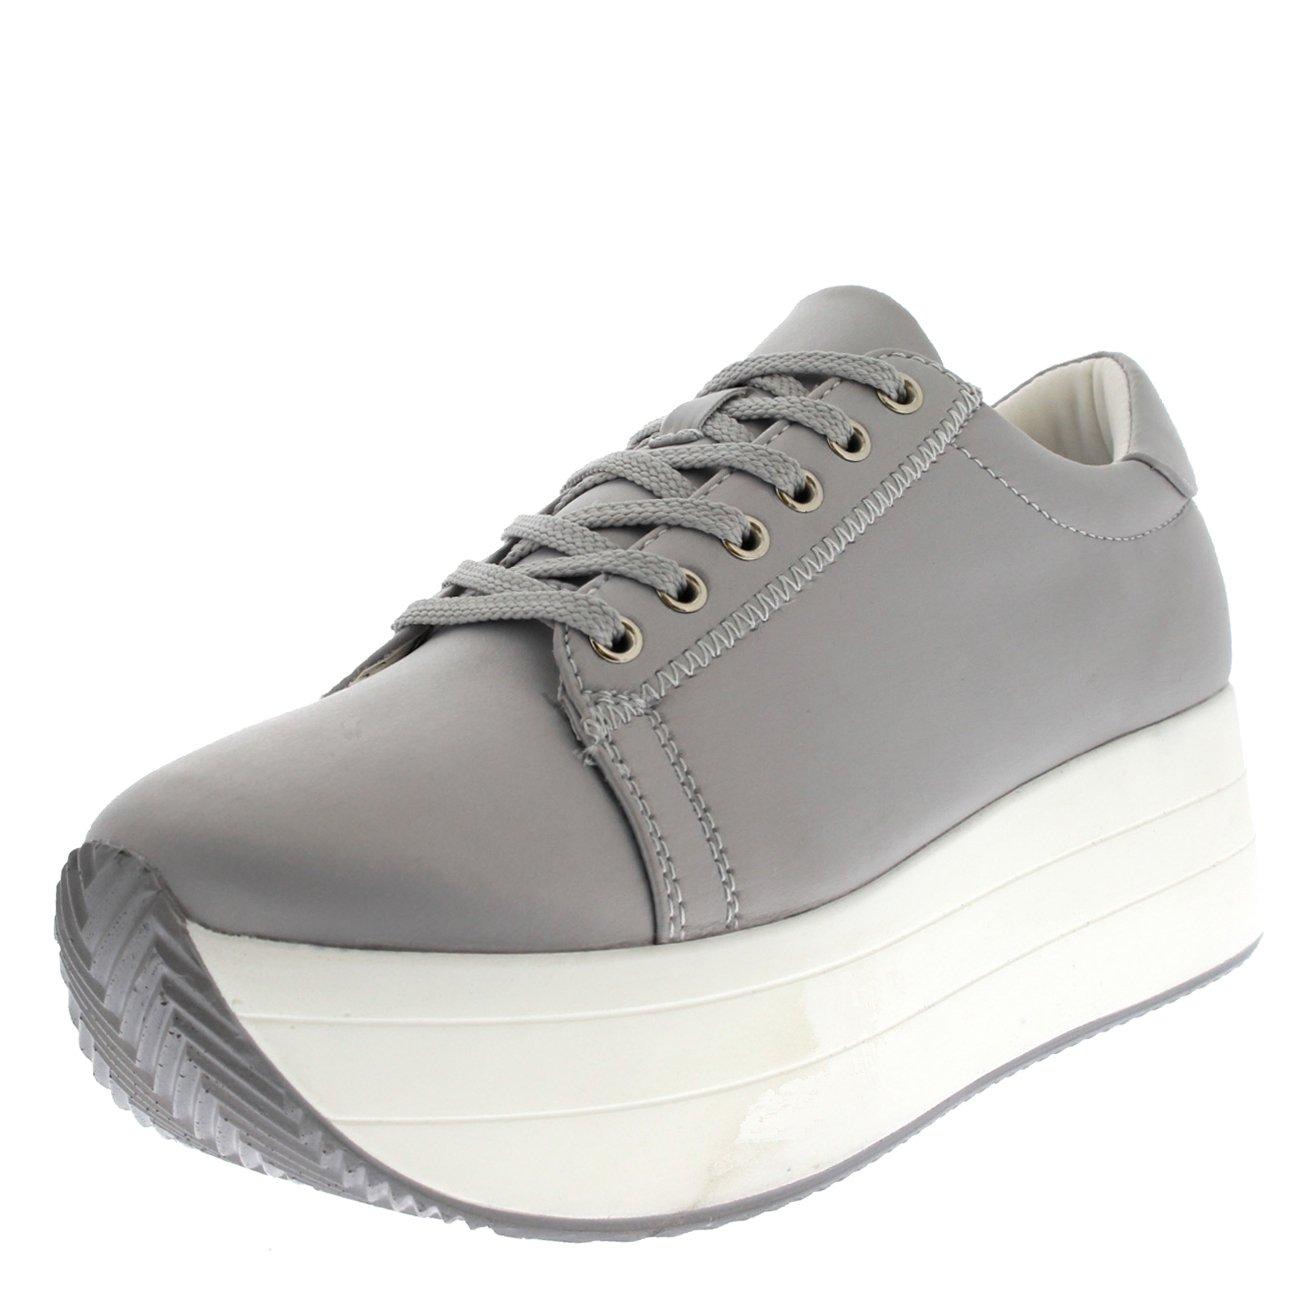 Womens Summer Chic Festival Casual Fashion Platform Wedge Heel Sneakers B071X9SC9H 5 B(M) US|Gray/White